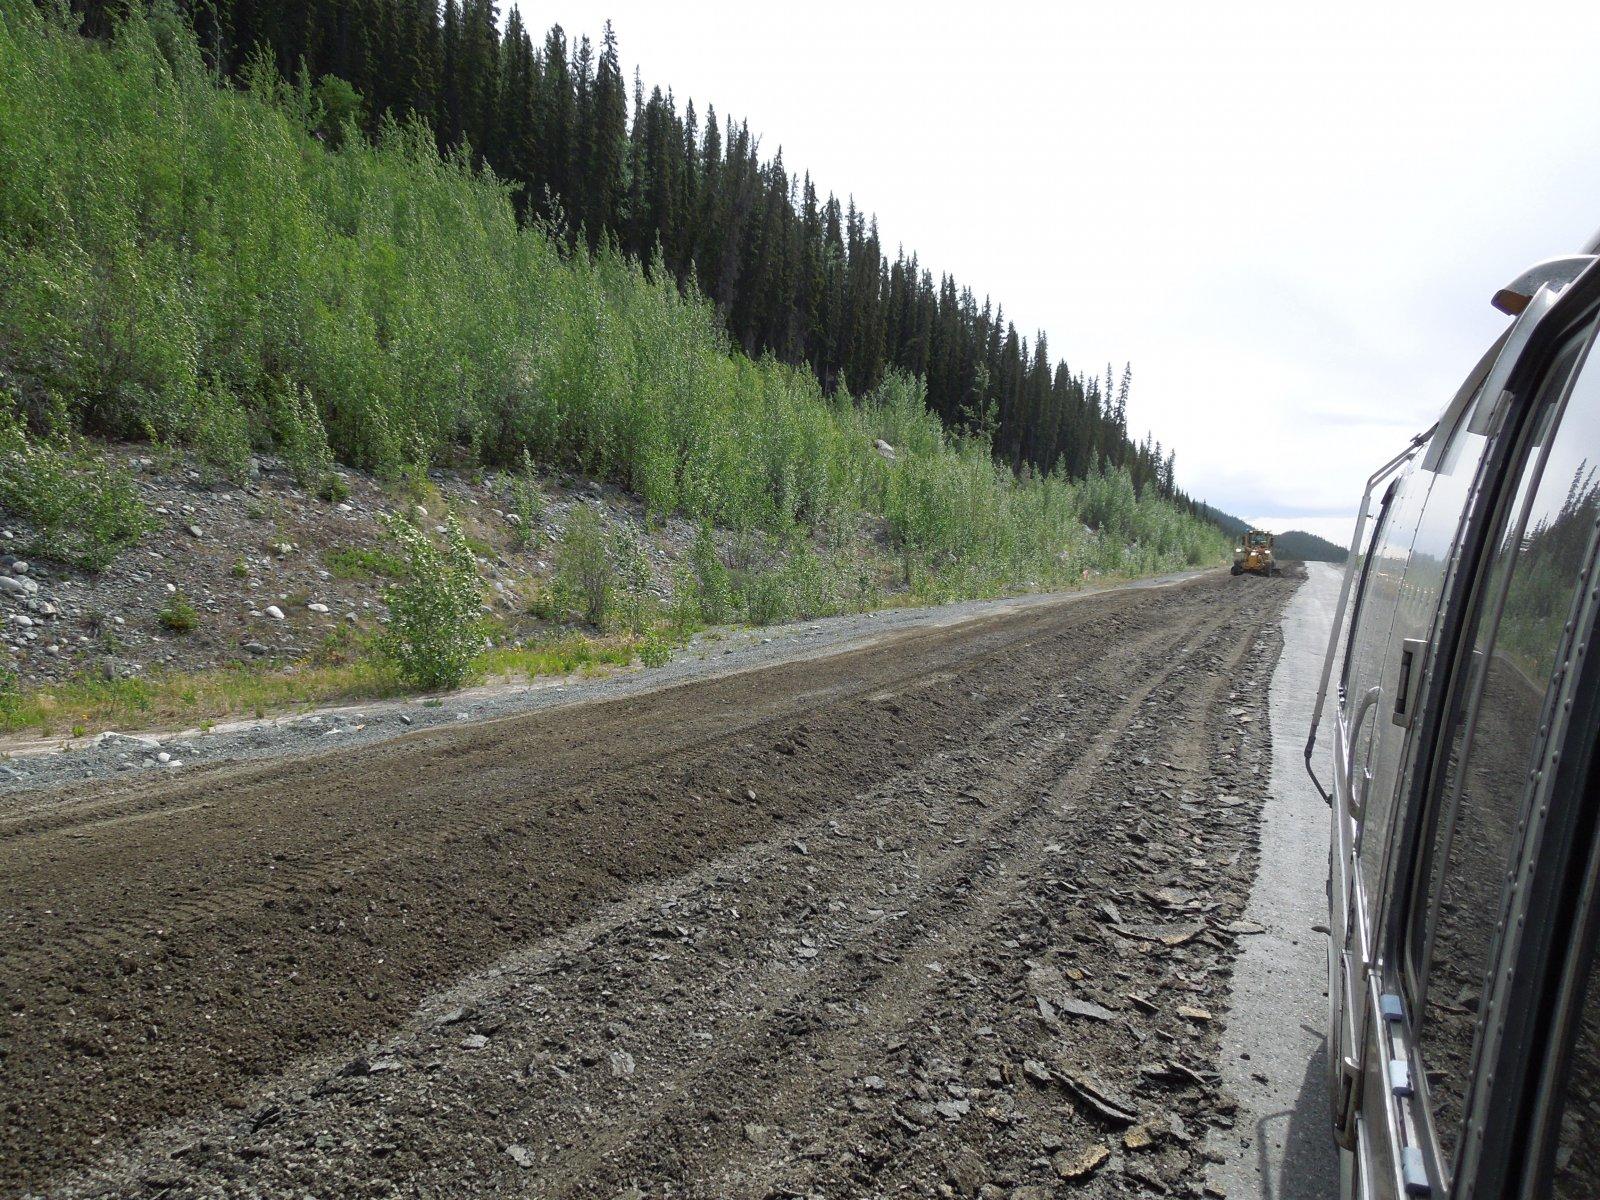 Click image for larger version  Name:Destruction Bay, YK to Tok, Alaska 002.jpg Views:66 Size:576.1 KB ID:215272